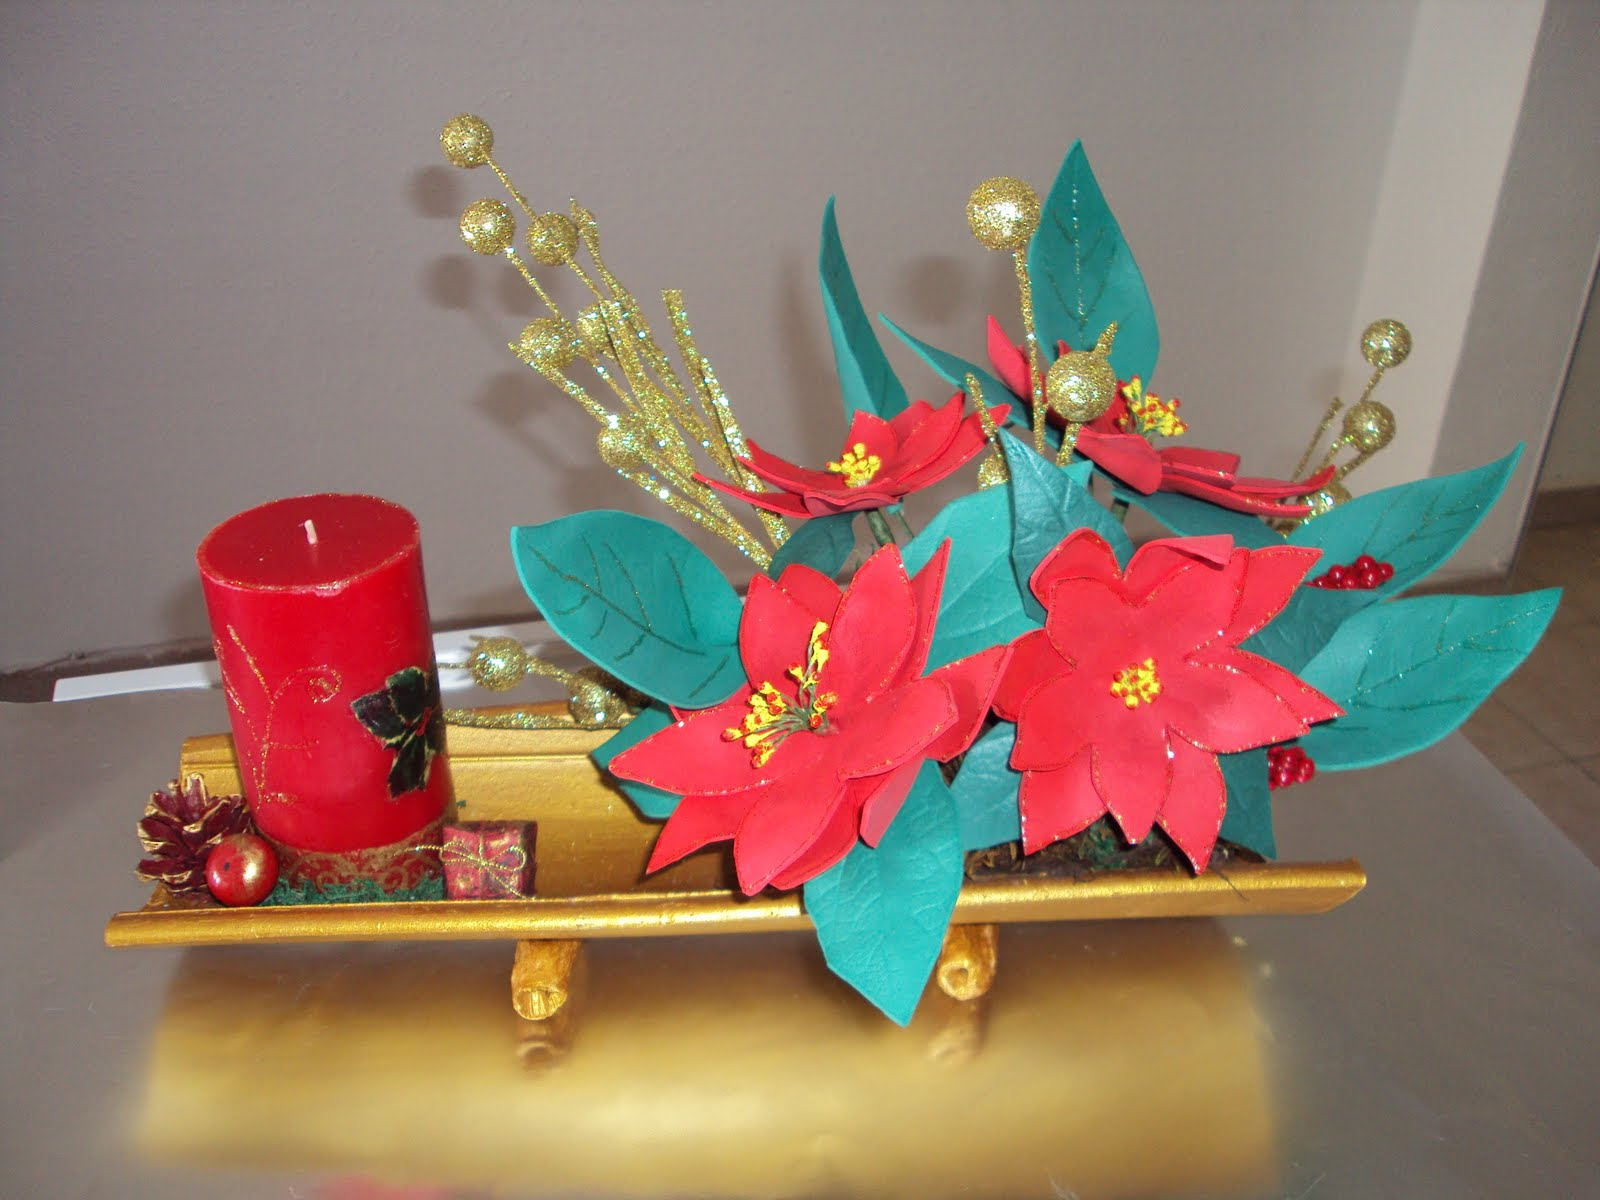 Manualidades a lo suyo centro de mesa navidad for Centro mesa navidad manualidades